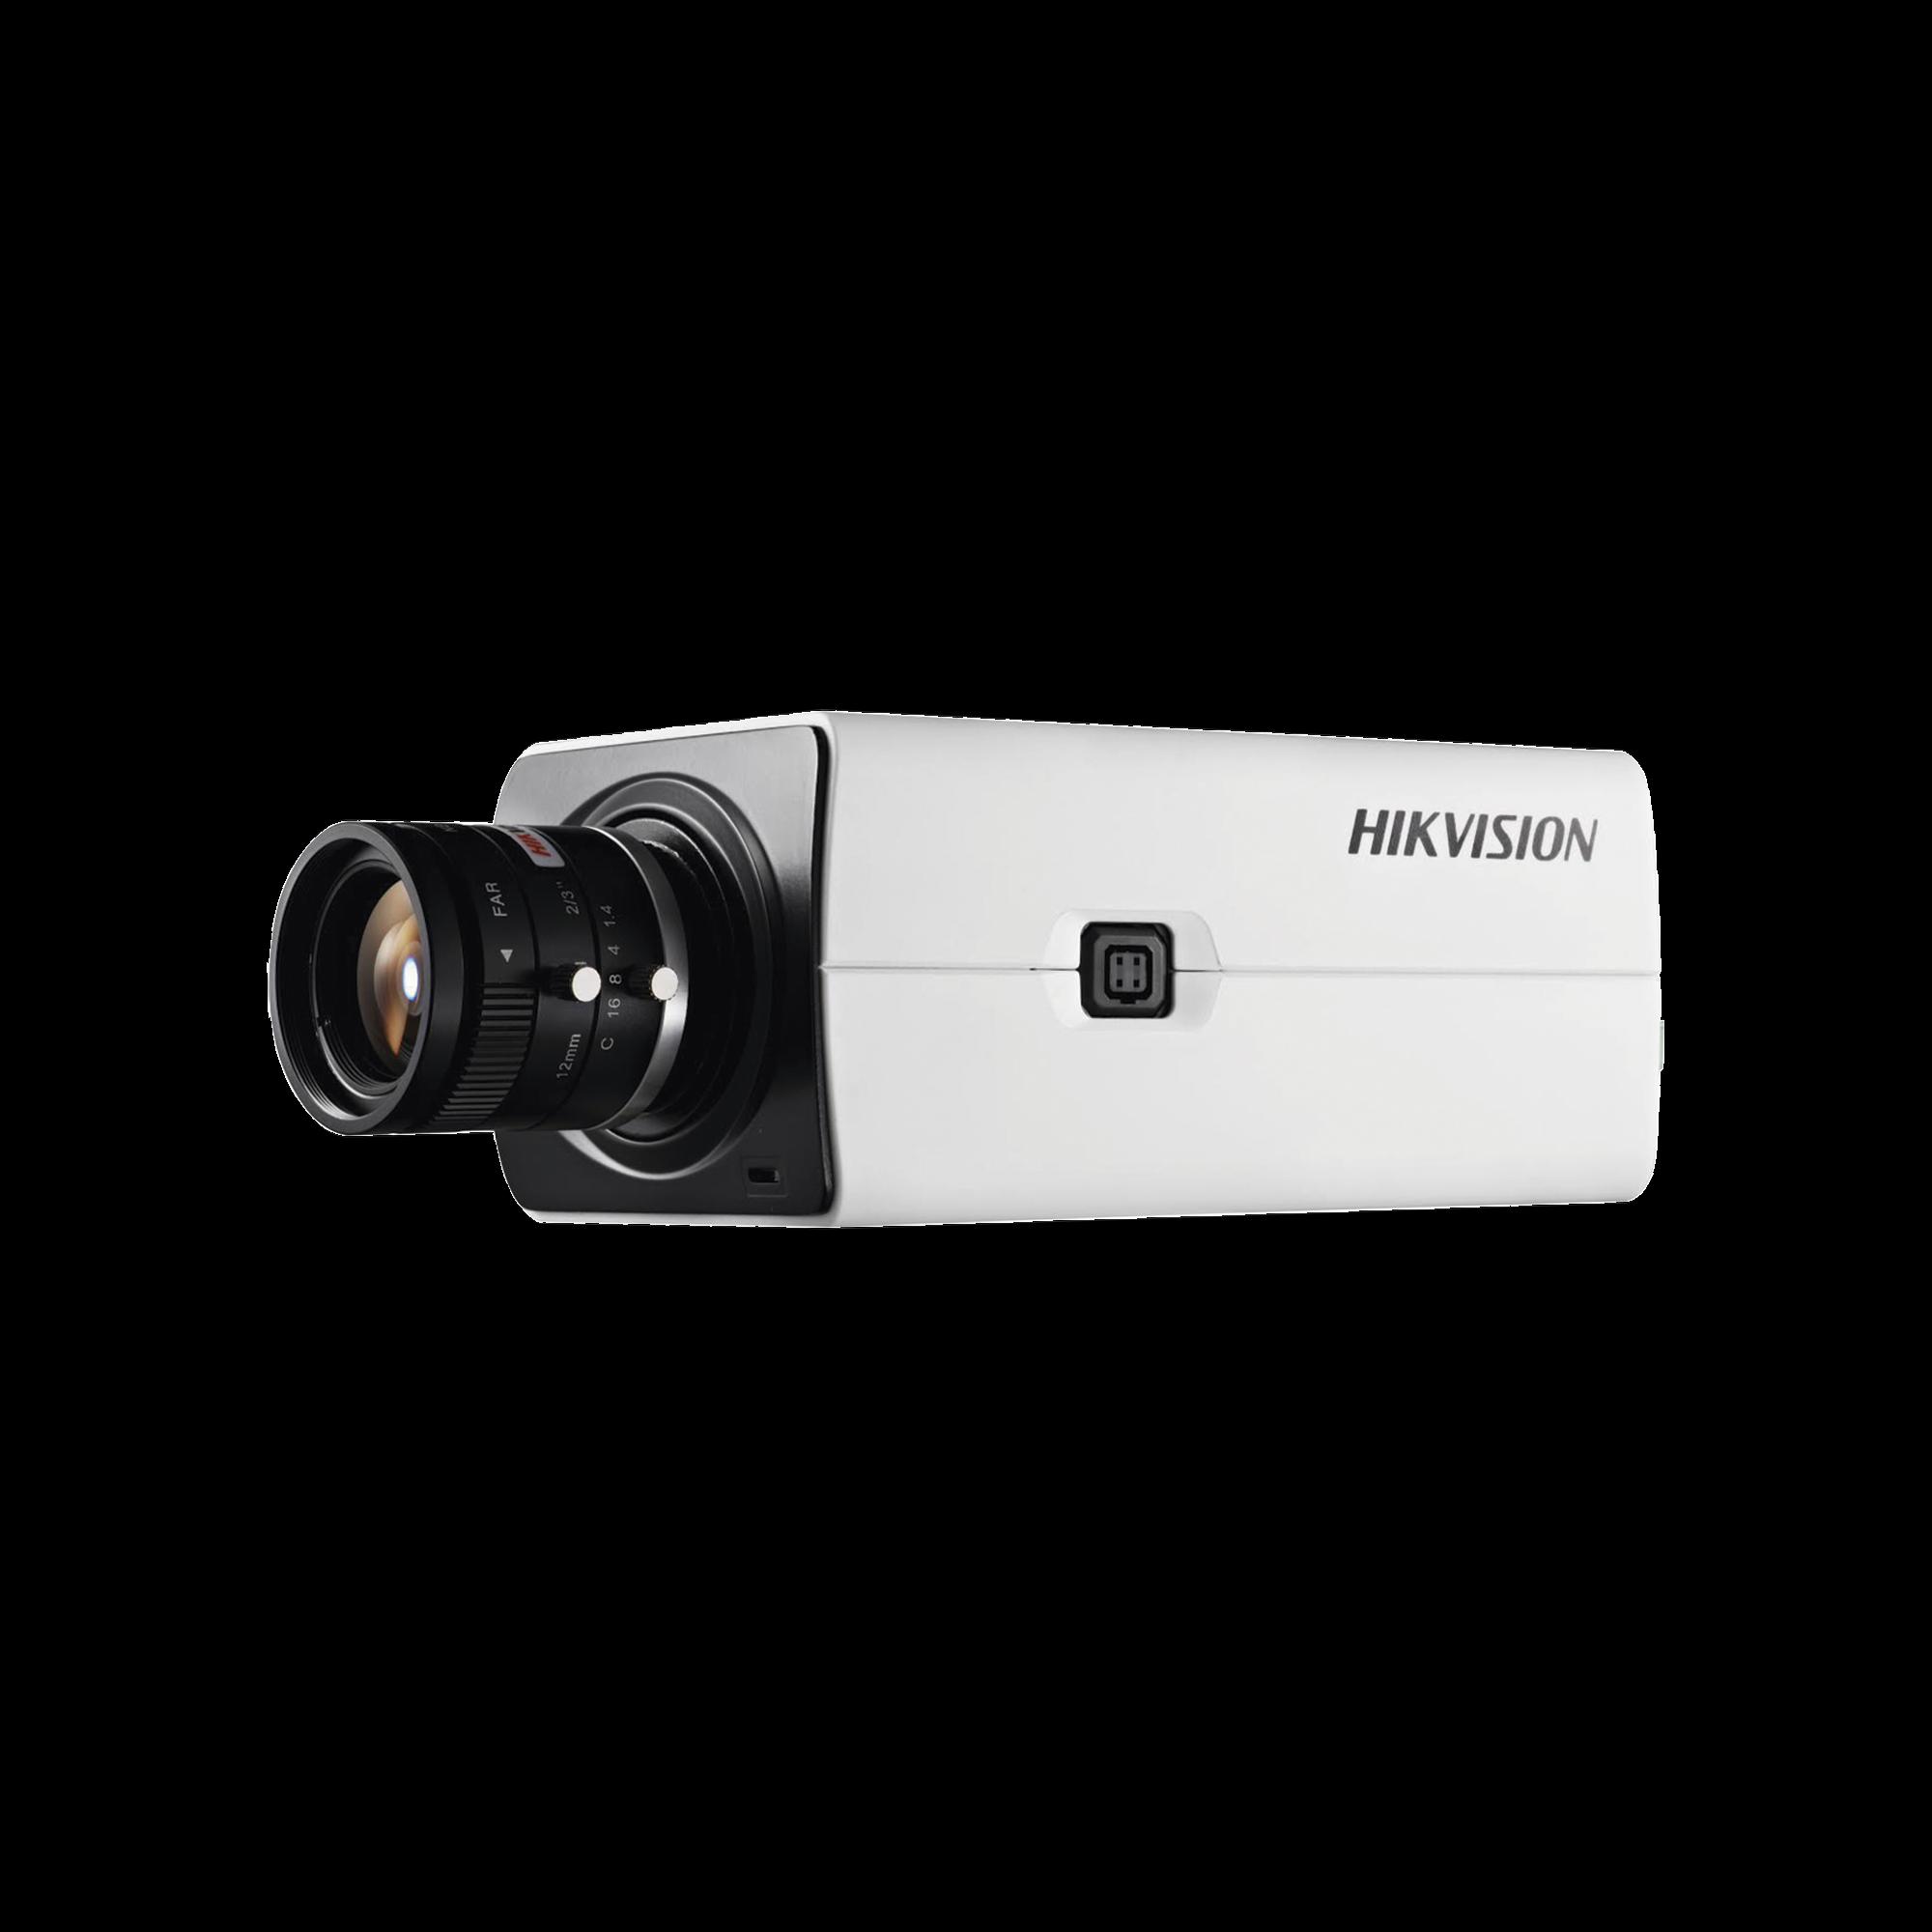 Camara Box IP 2 Megapixel / Serie PRO / Ultra Baja Iluminacion / PoE / 12 VCD / WDR 120 dB / Micro SD / Onvif